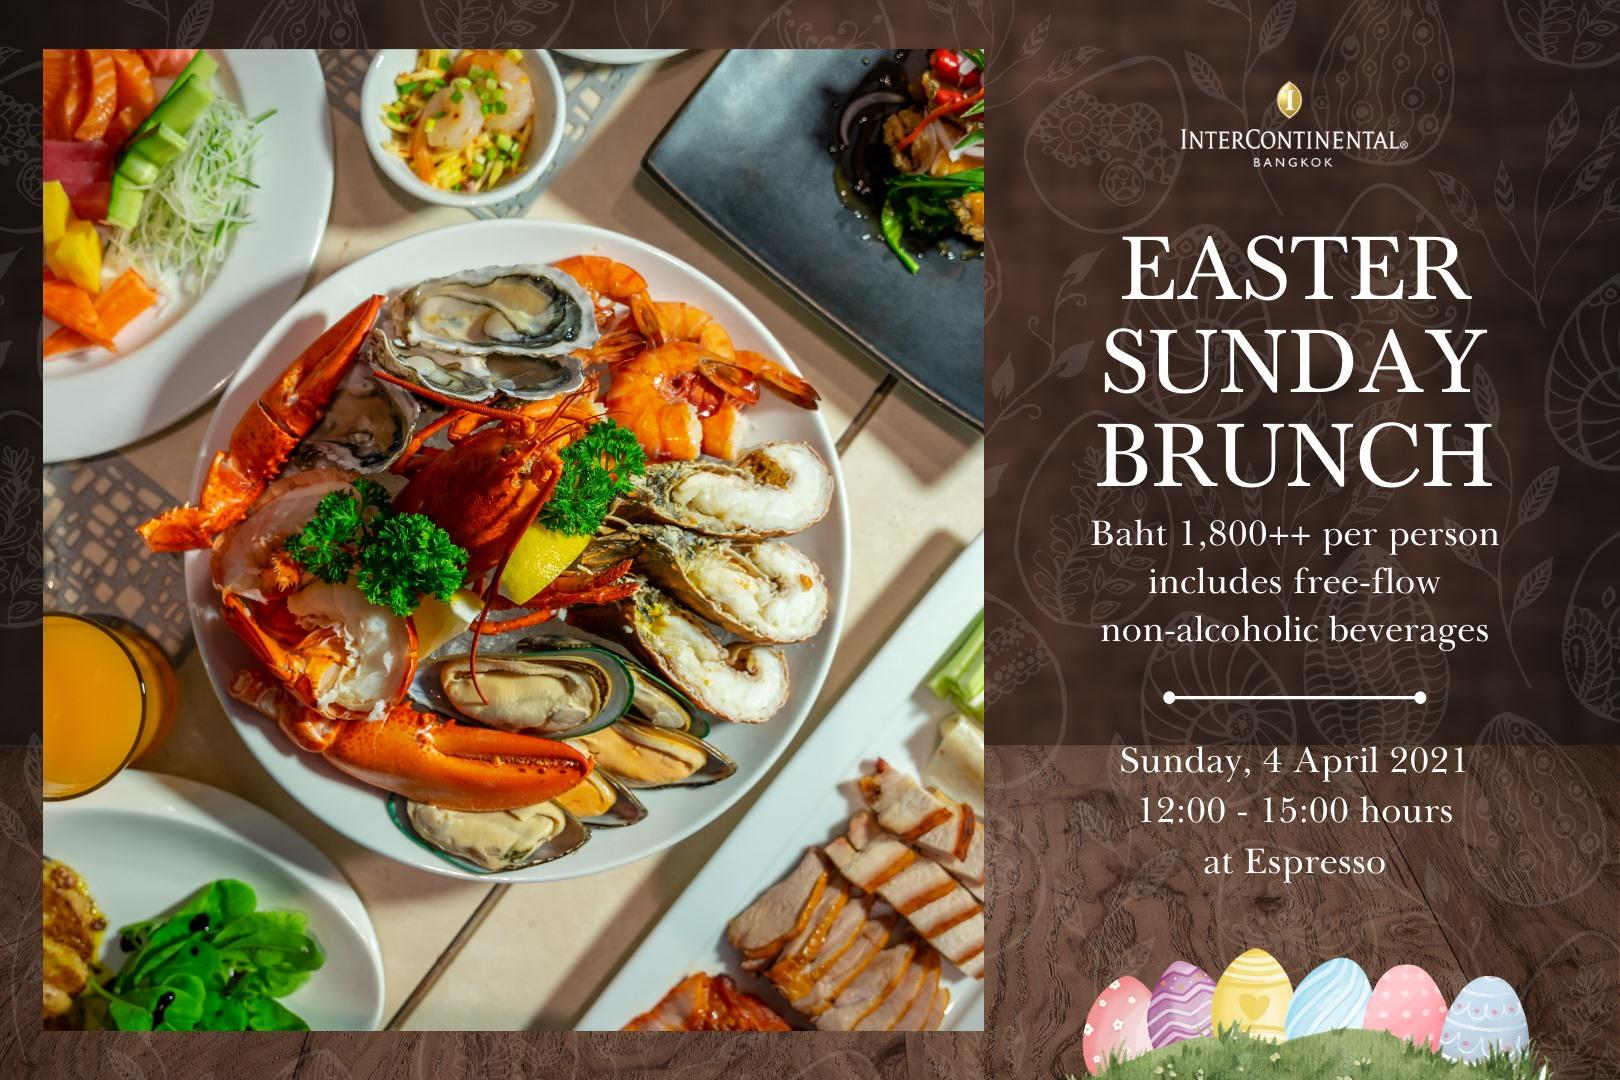 Easter Sunday Brunch at InterContientail Bangkok